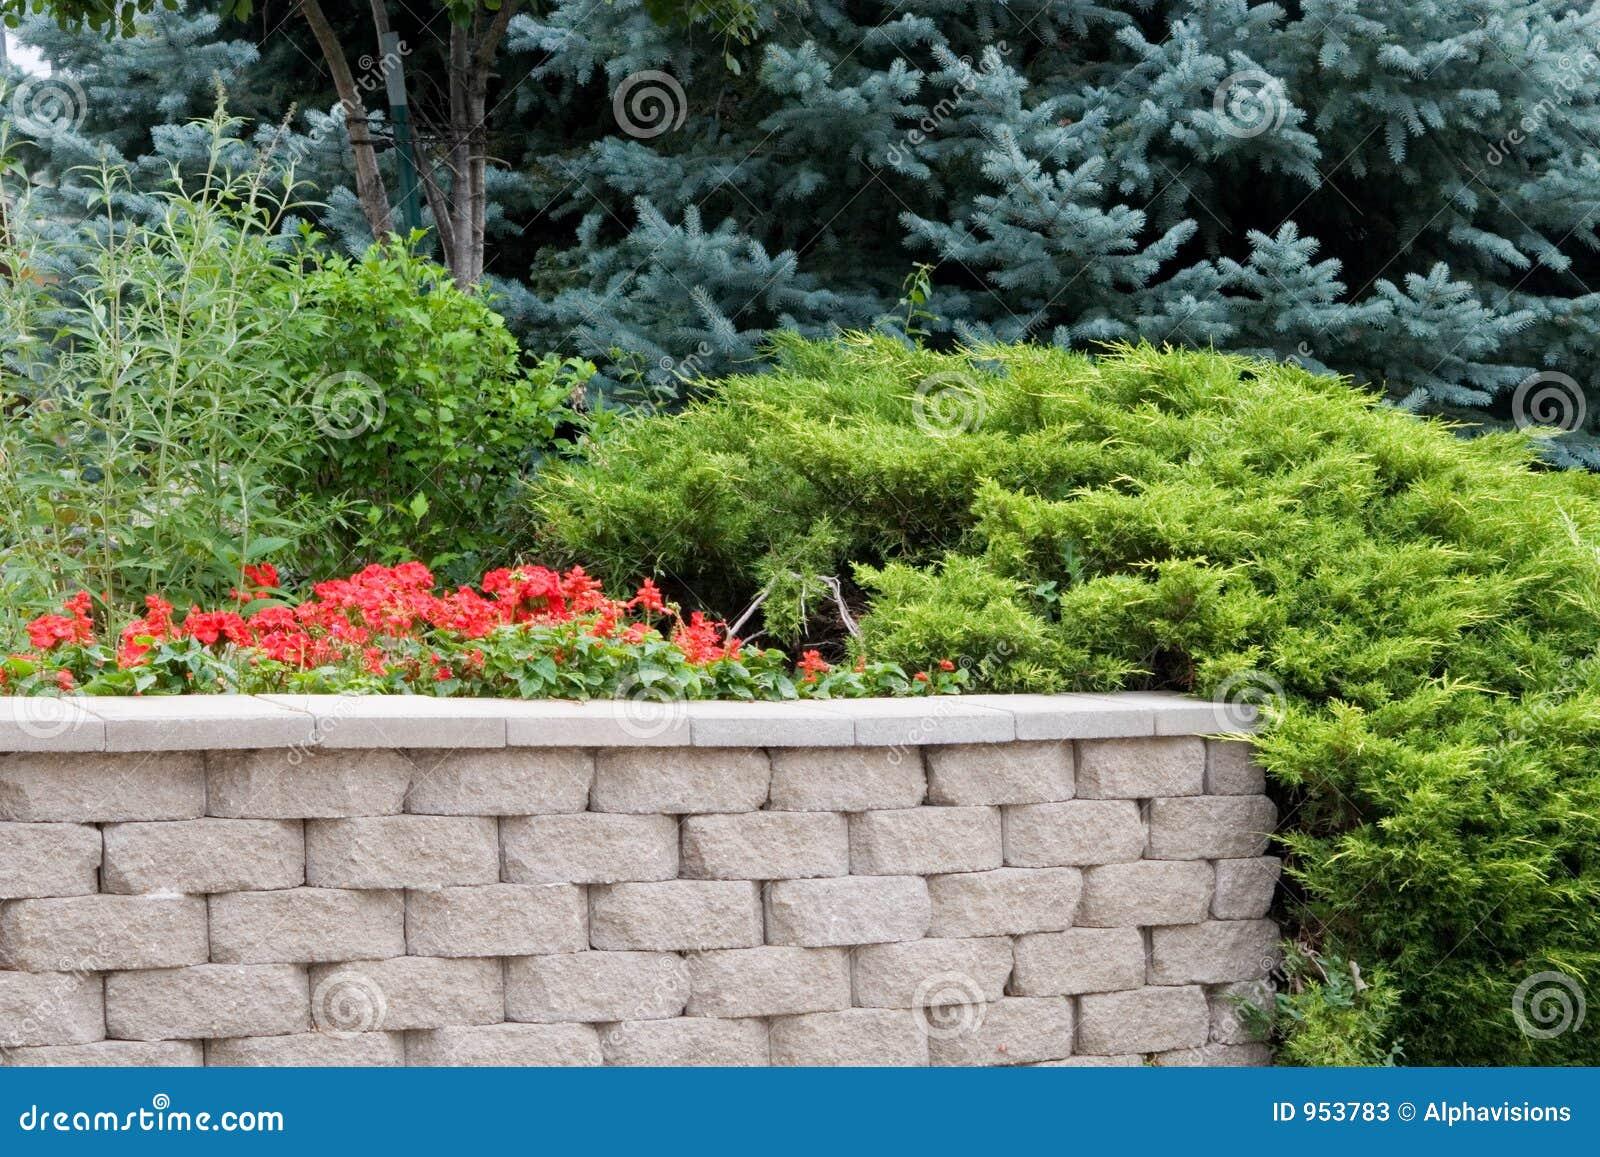 Evergreen Landscape Design Stock Photos Image 953783